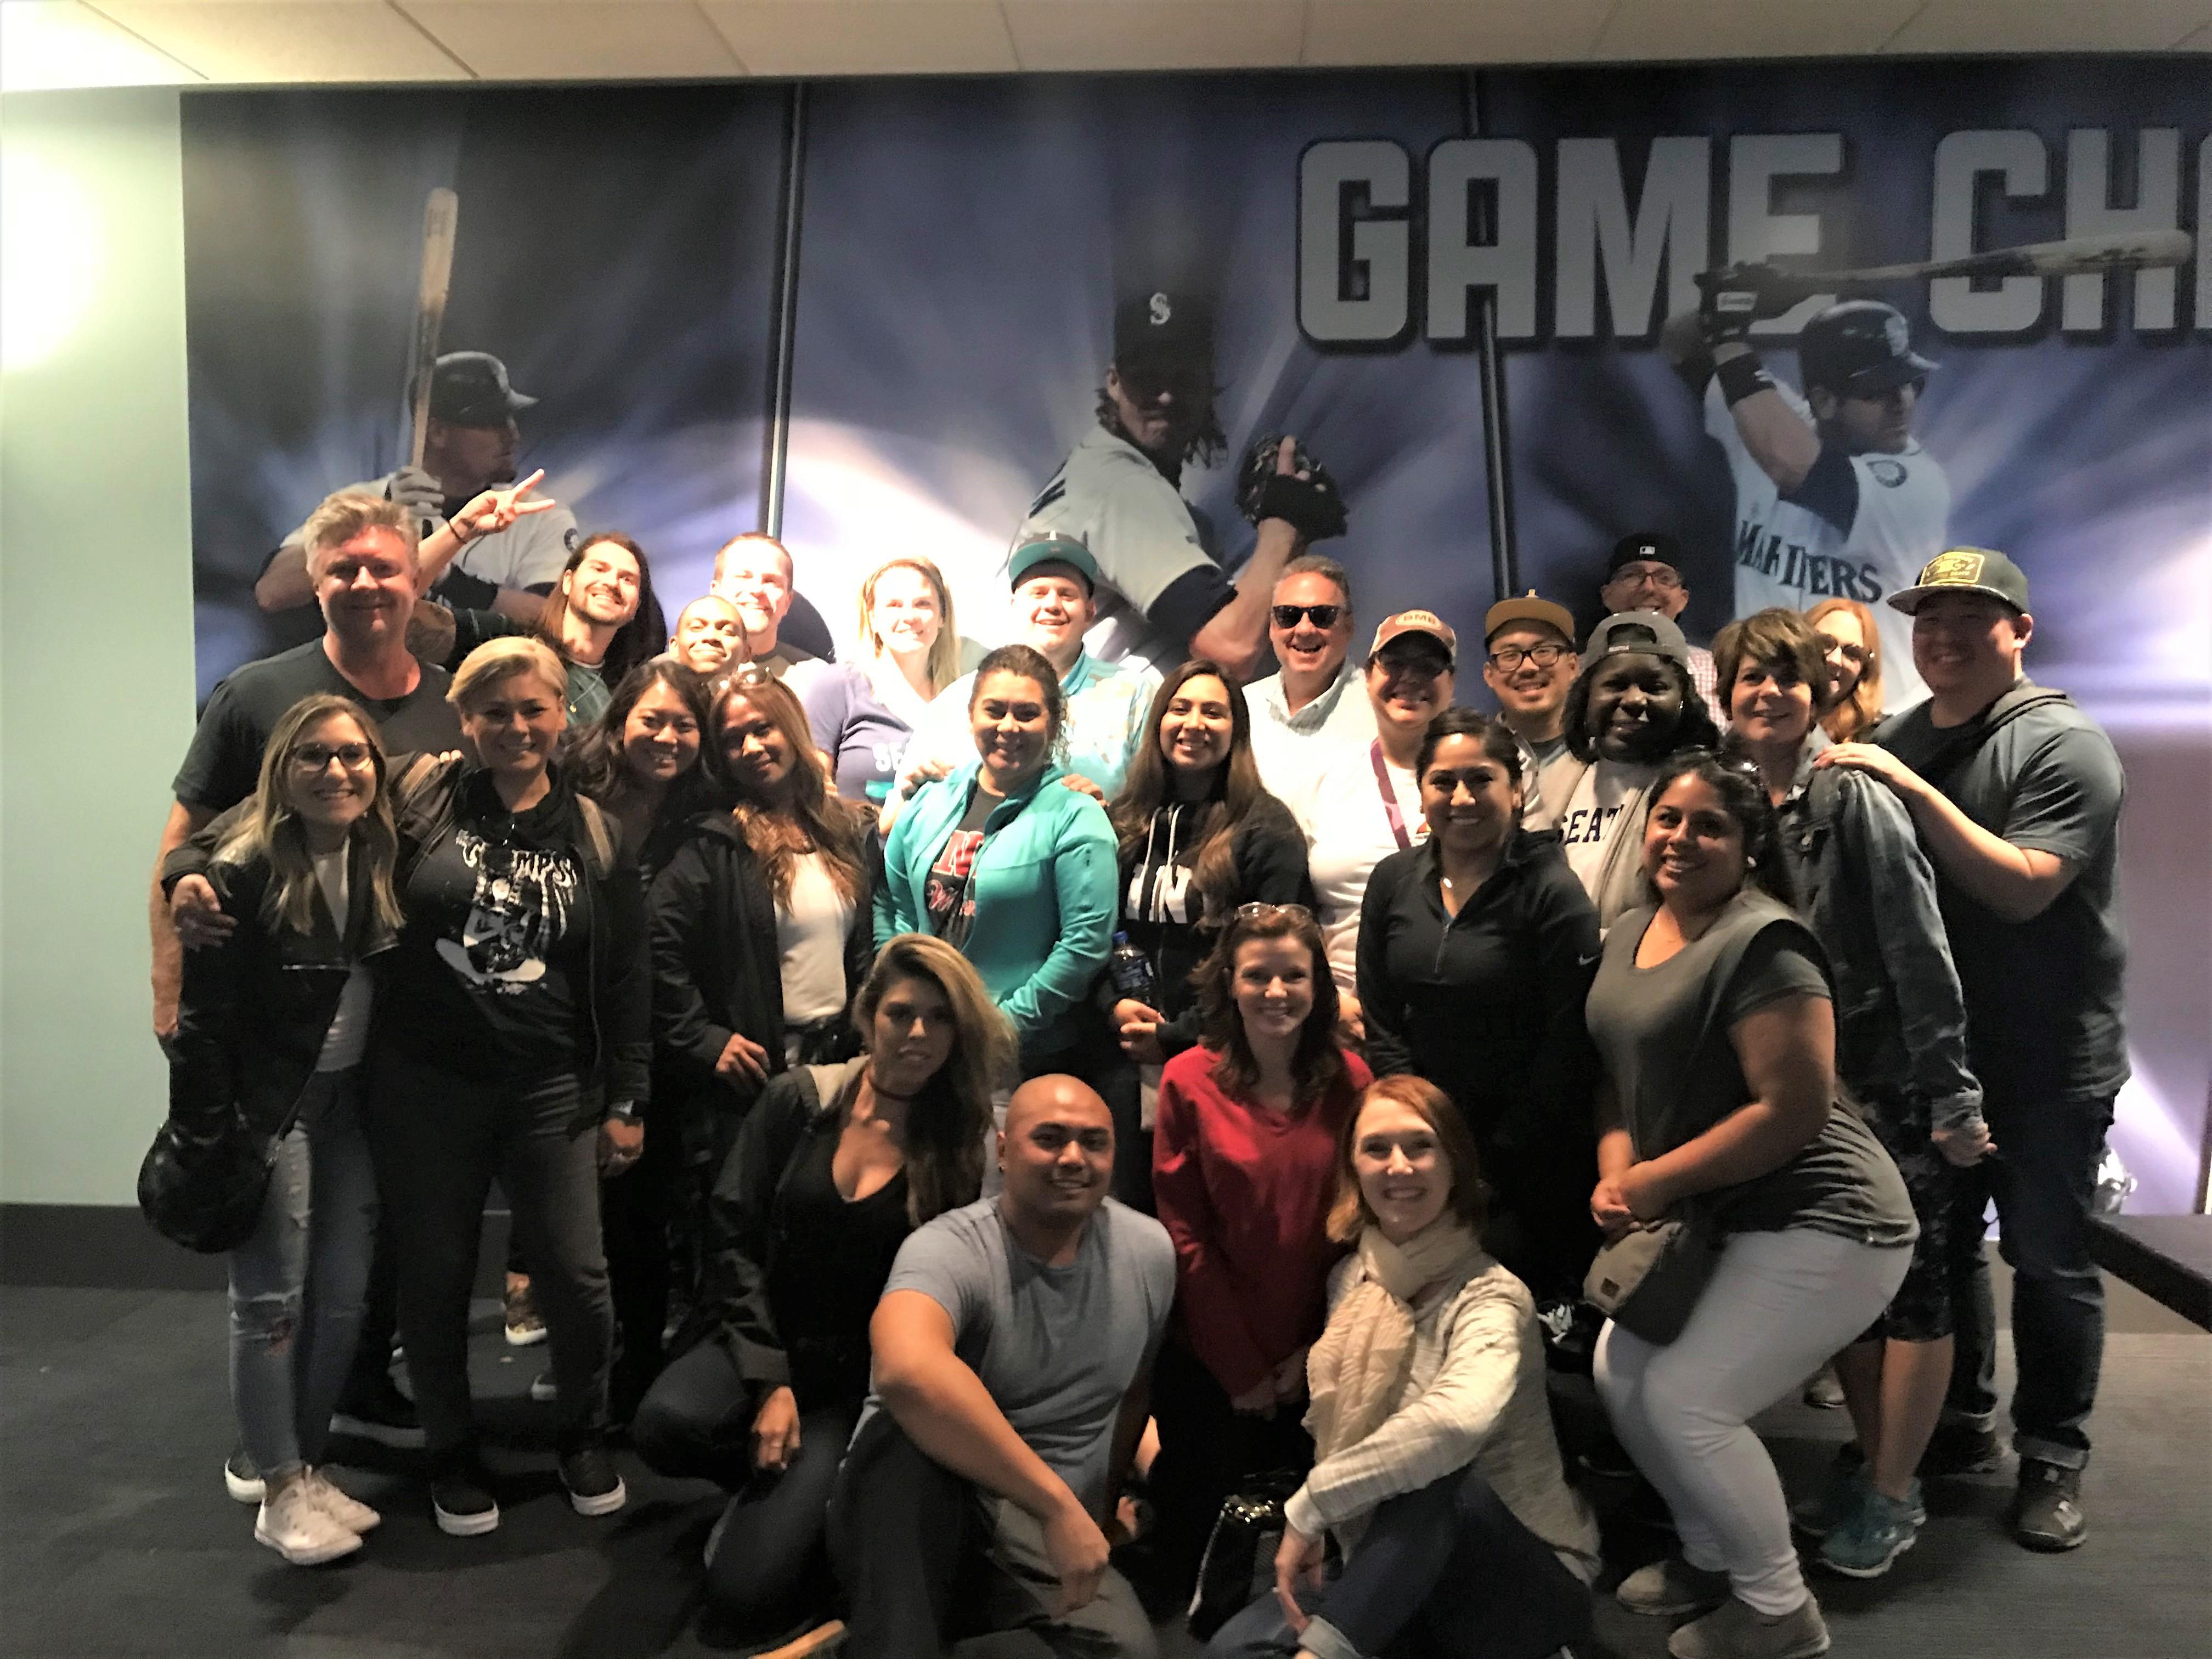 Mariners Game Group Photo